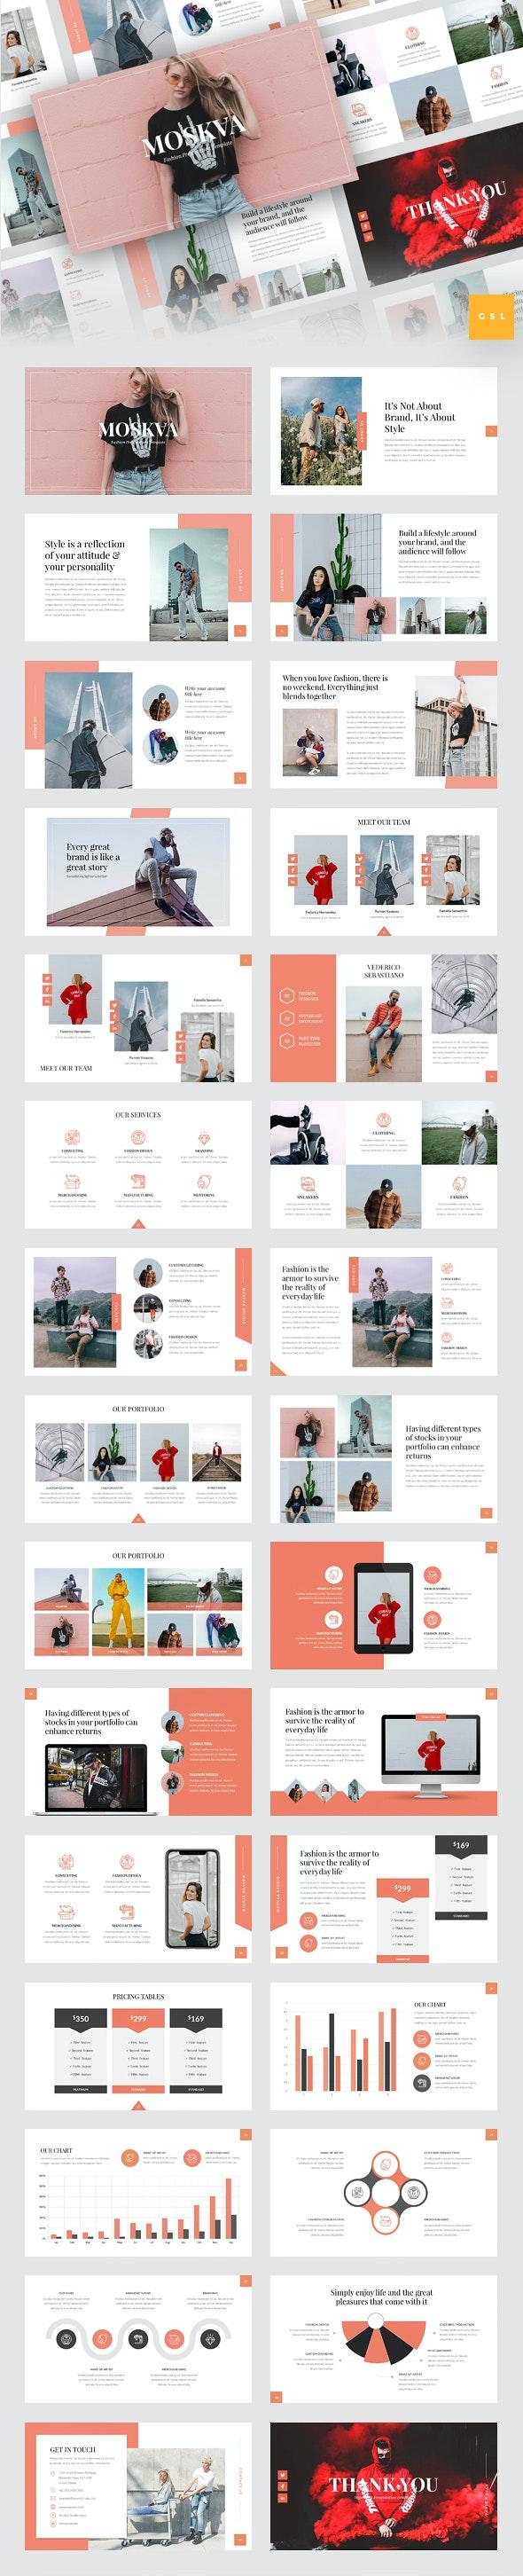 Moskva - Fashion Google Slides Template - Google Slides Presentation Templates